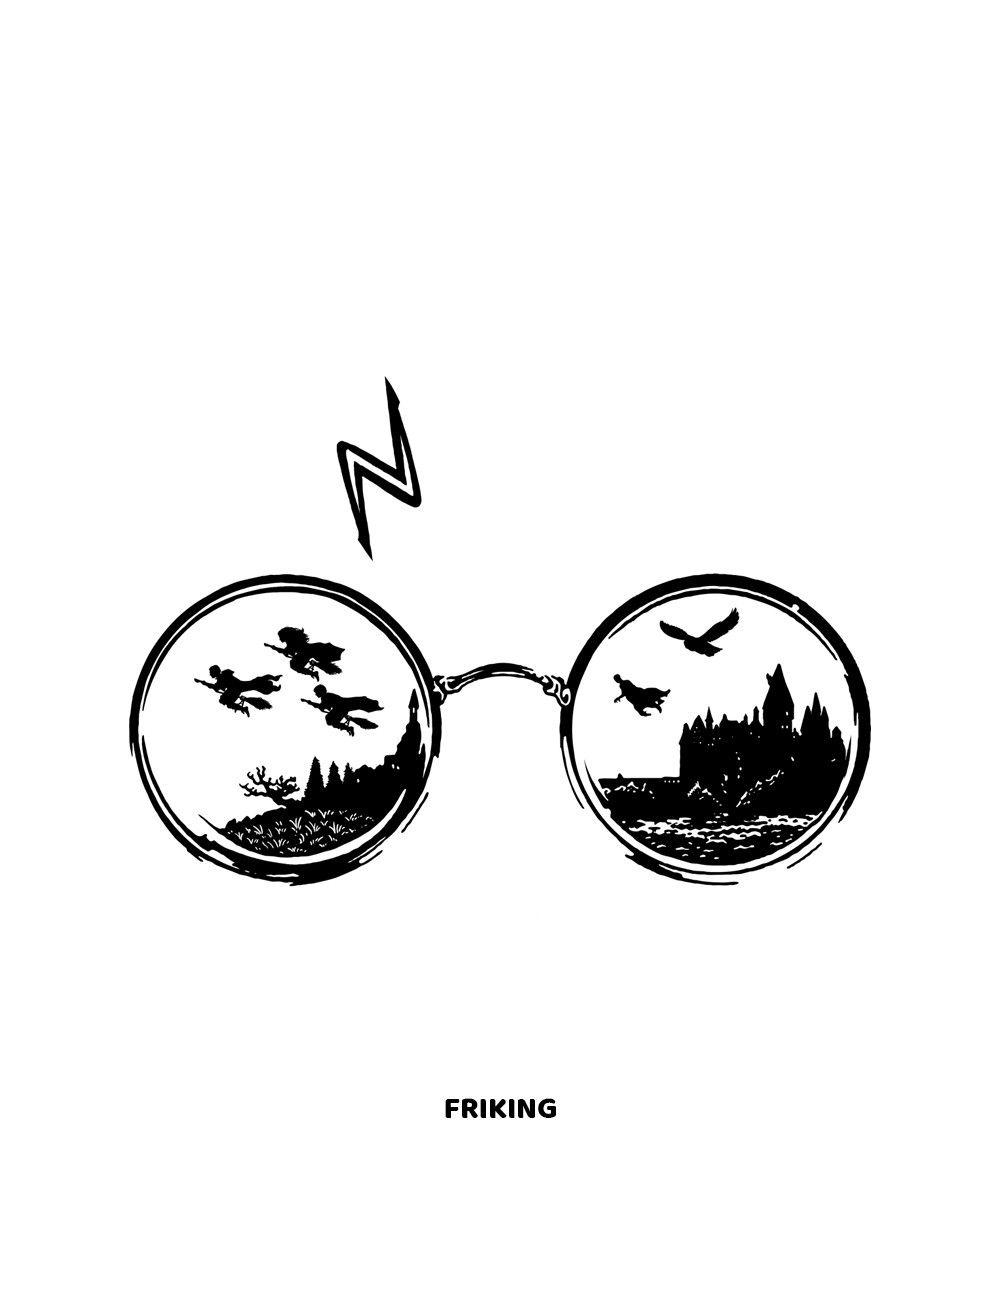 H.P. Glasses